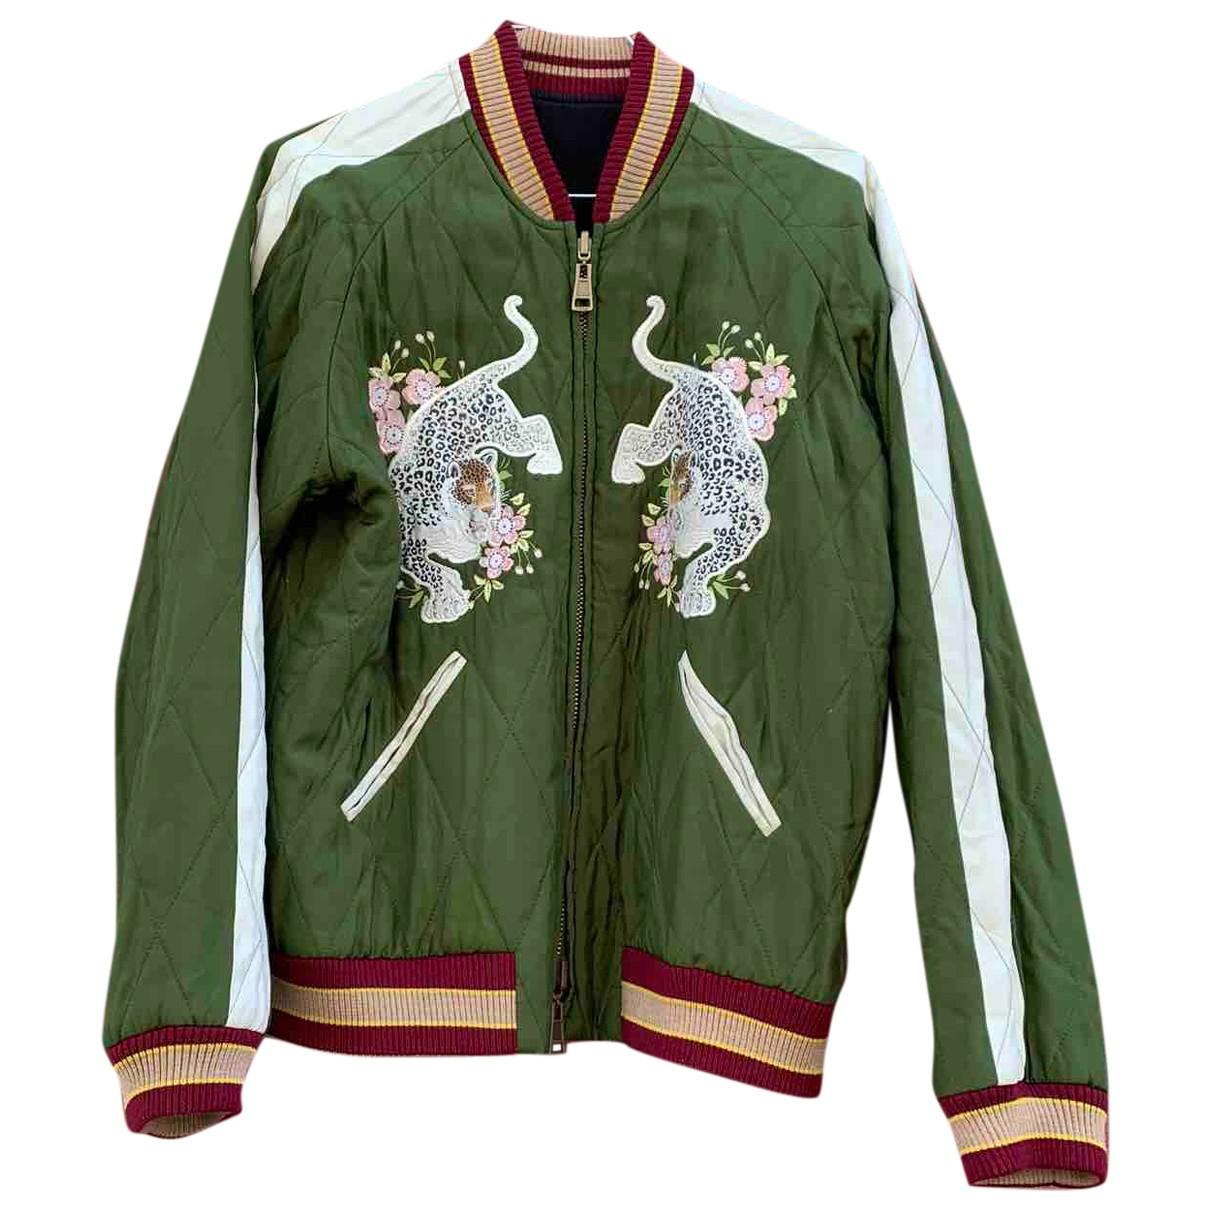 Chloé N Green jacket for Women 36 FR